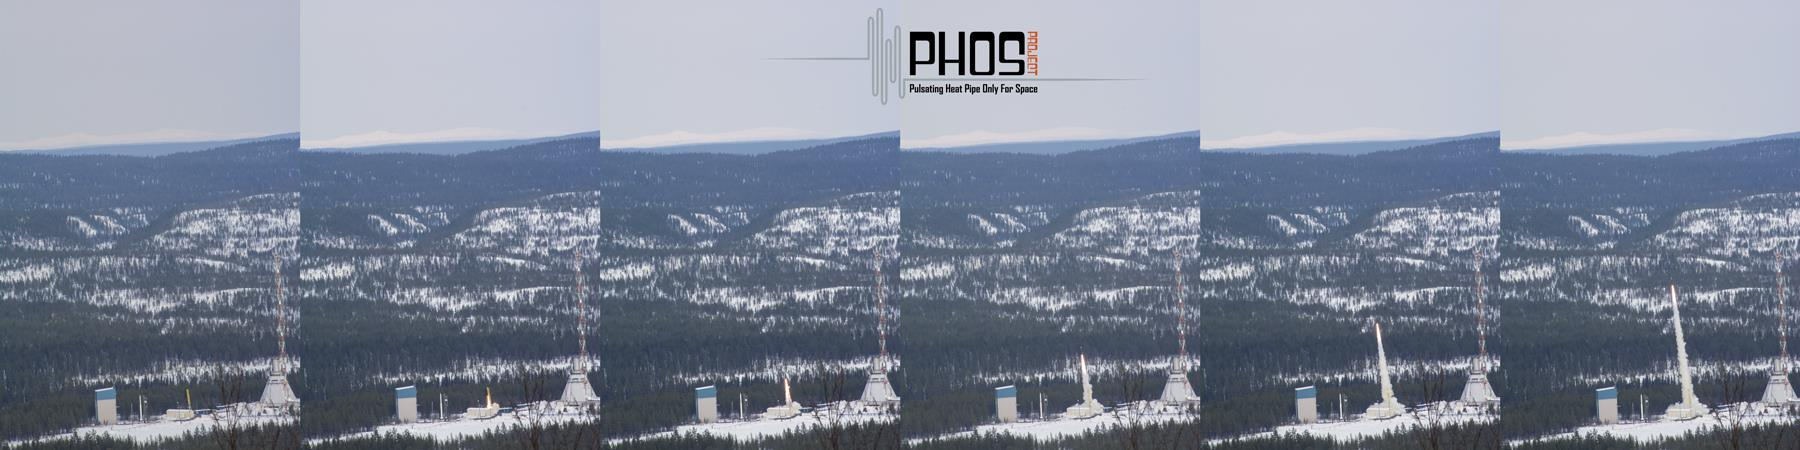 PhosProject-Kiruna-2015